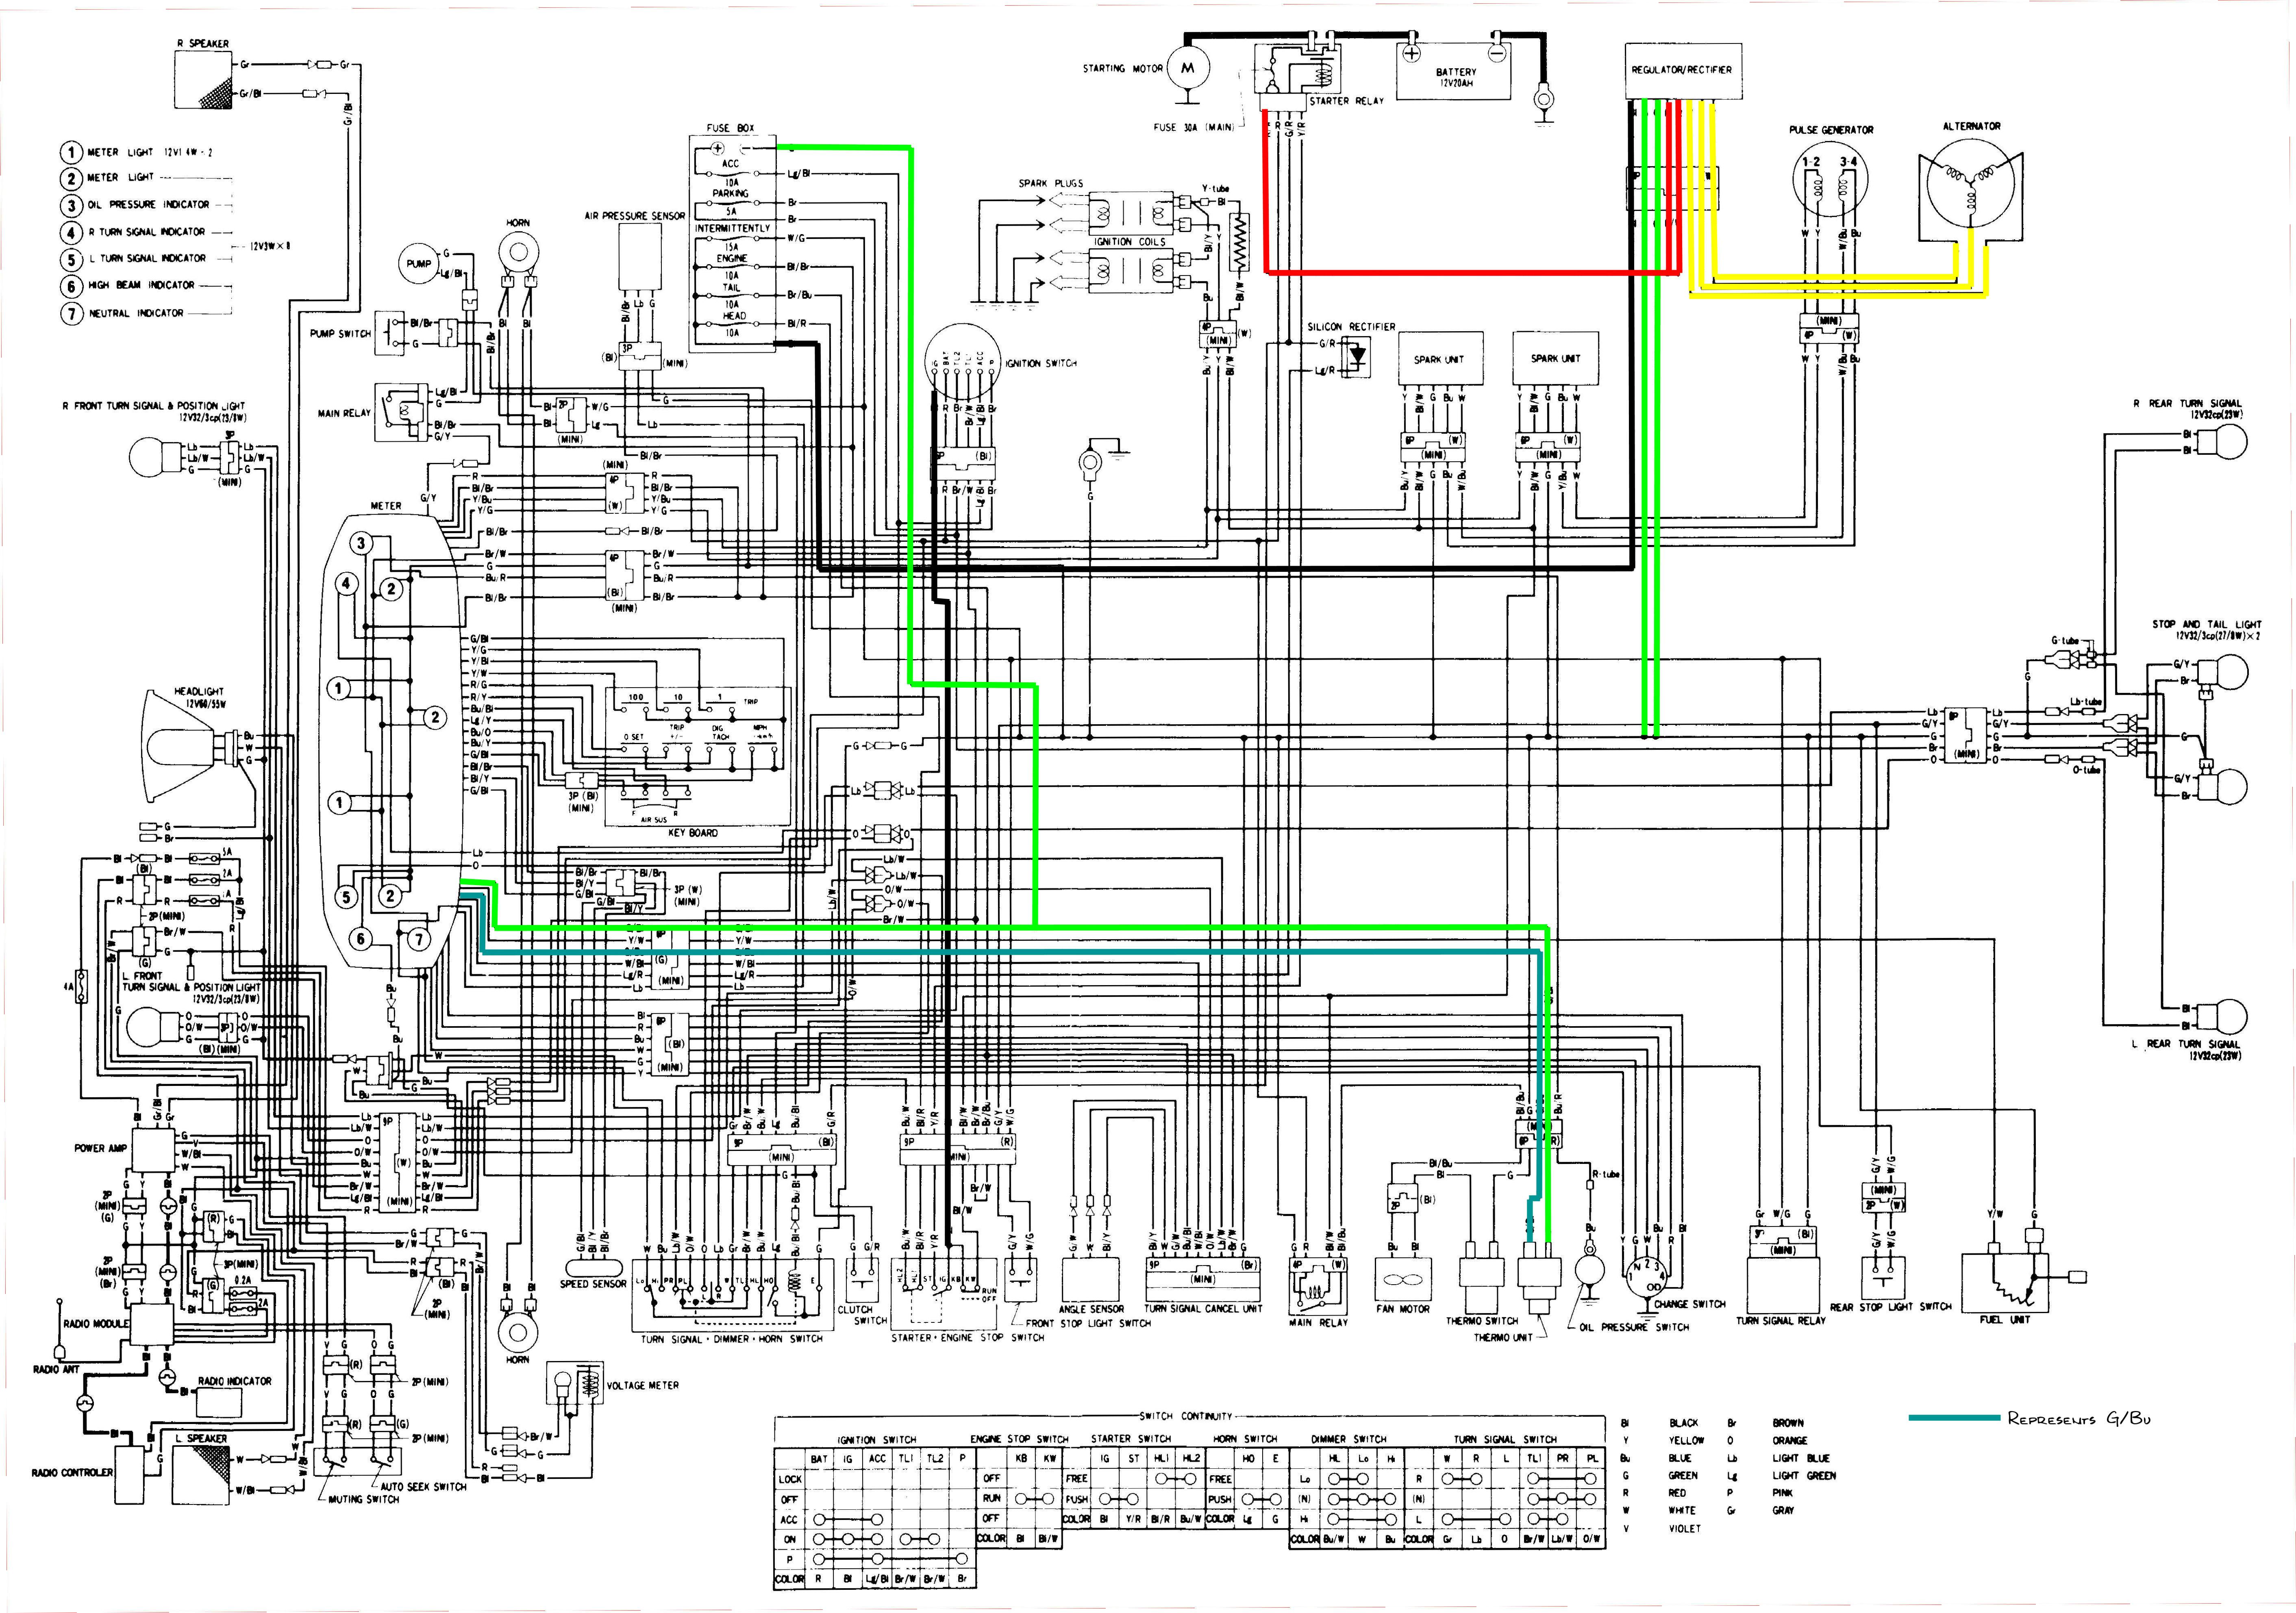 goldwing 1100 wiring diagram xf 9477  2013 goldwing wiring diagram  xf 9477  2013 goldwing wiring diagram